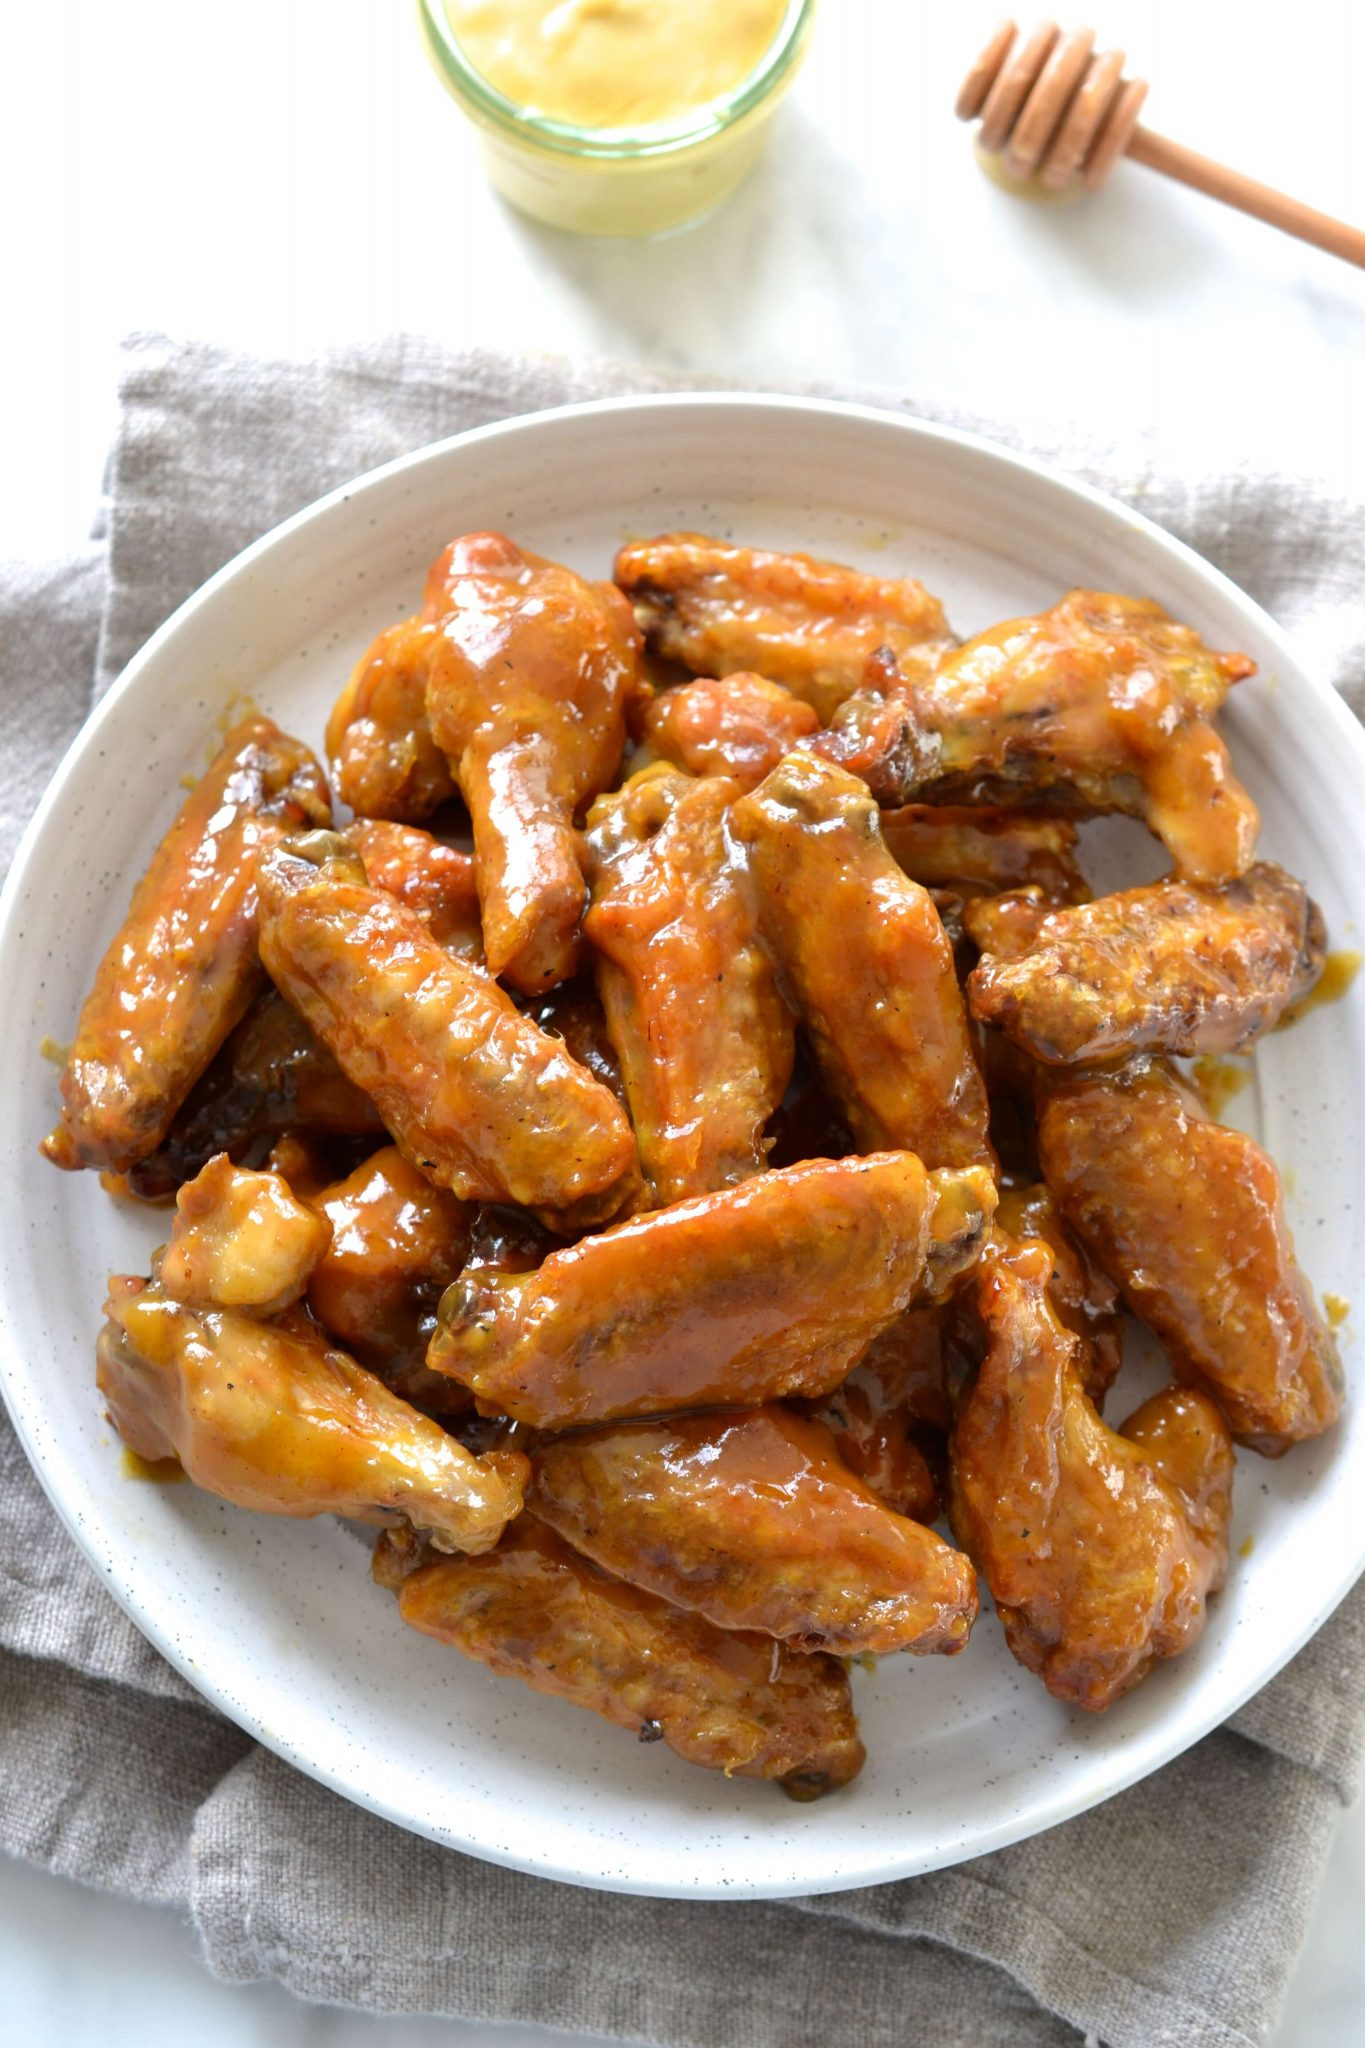 Honey Mustard Chicken Wings Paleo Scd Every Last Bite